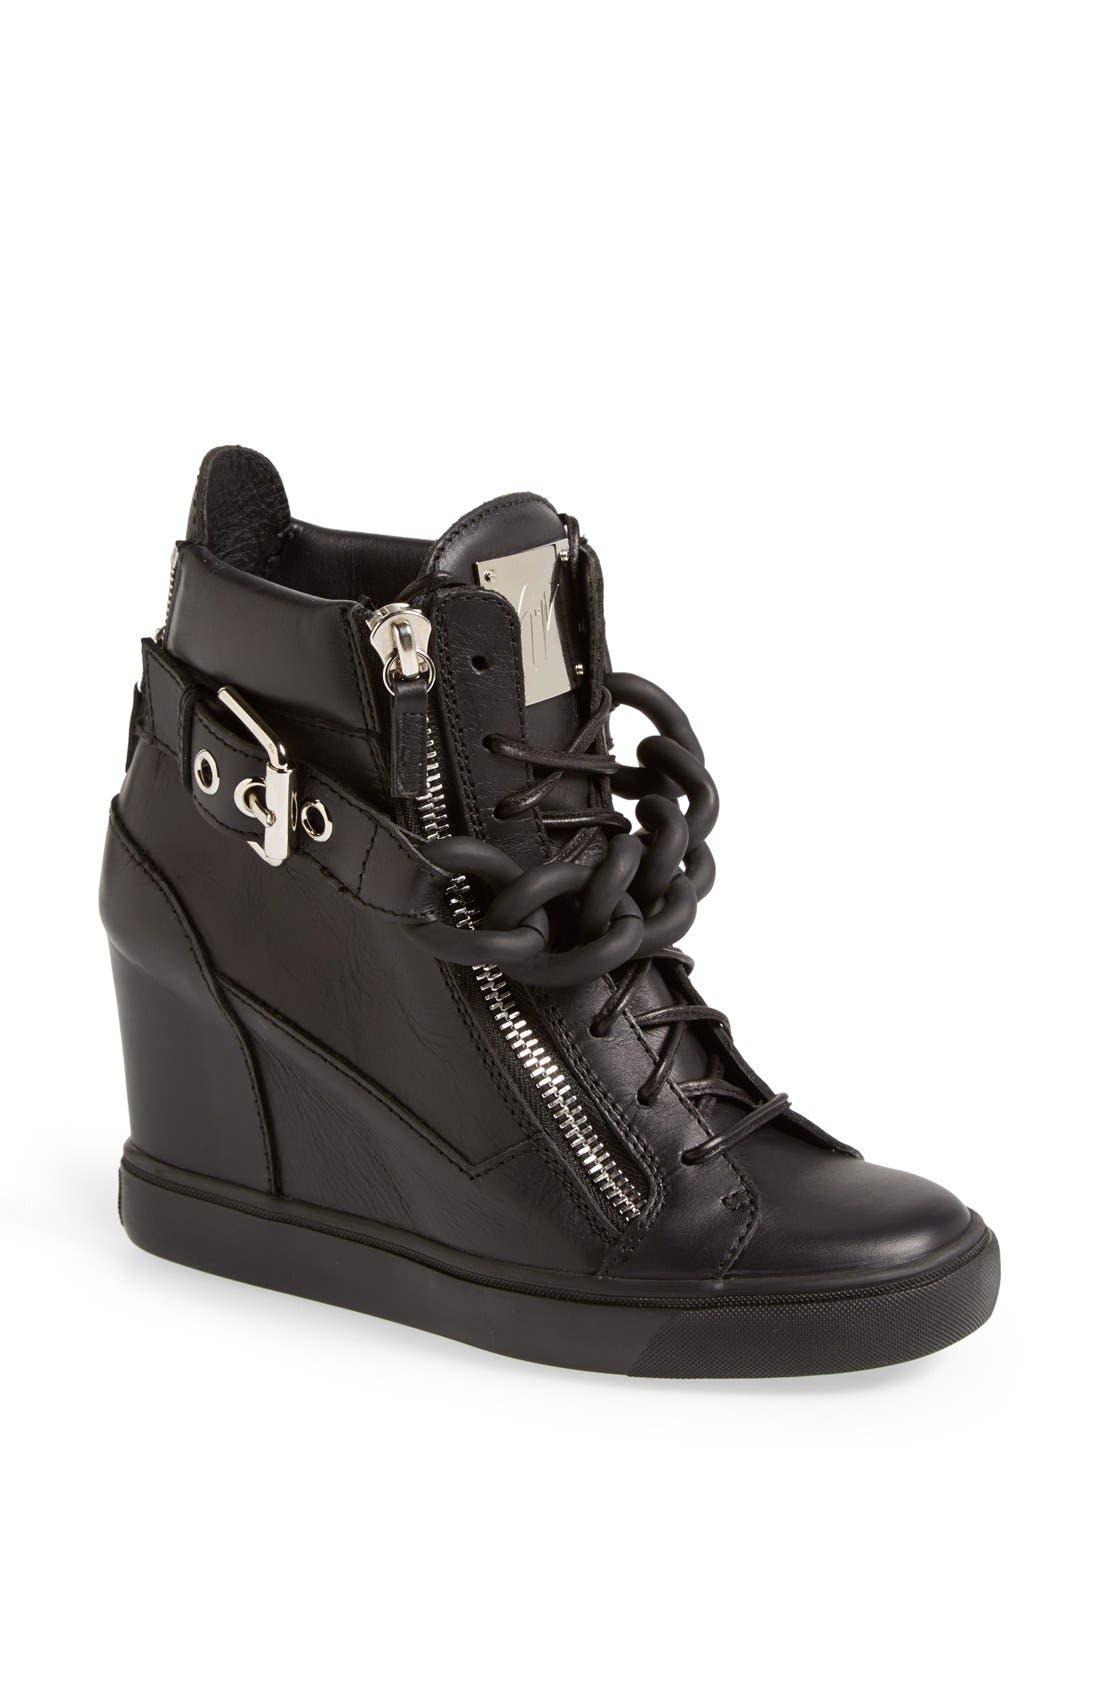 Alternate Image 1 Selected - Giuseppe Zanotti High Top Wedge Sneaker